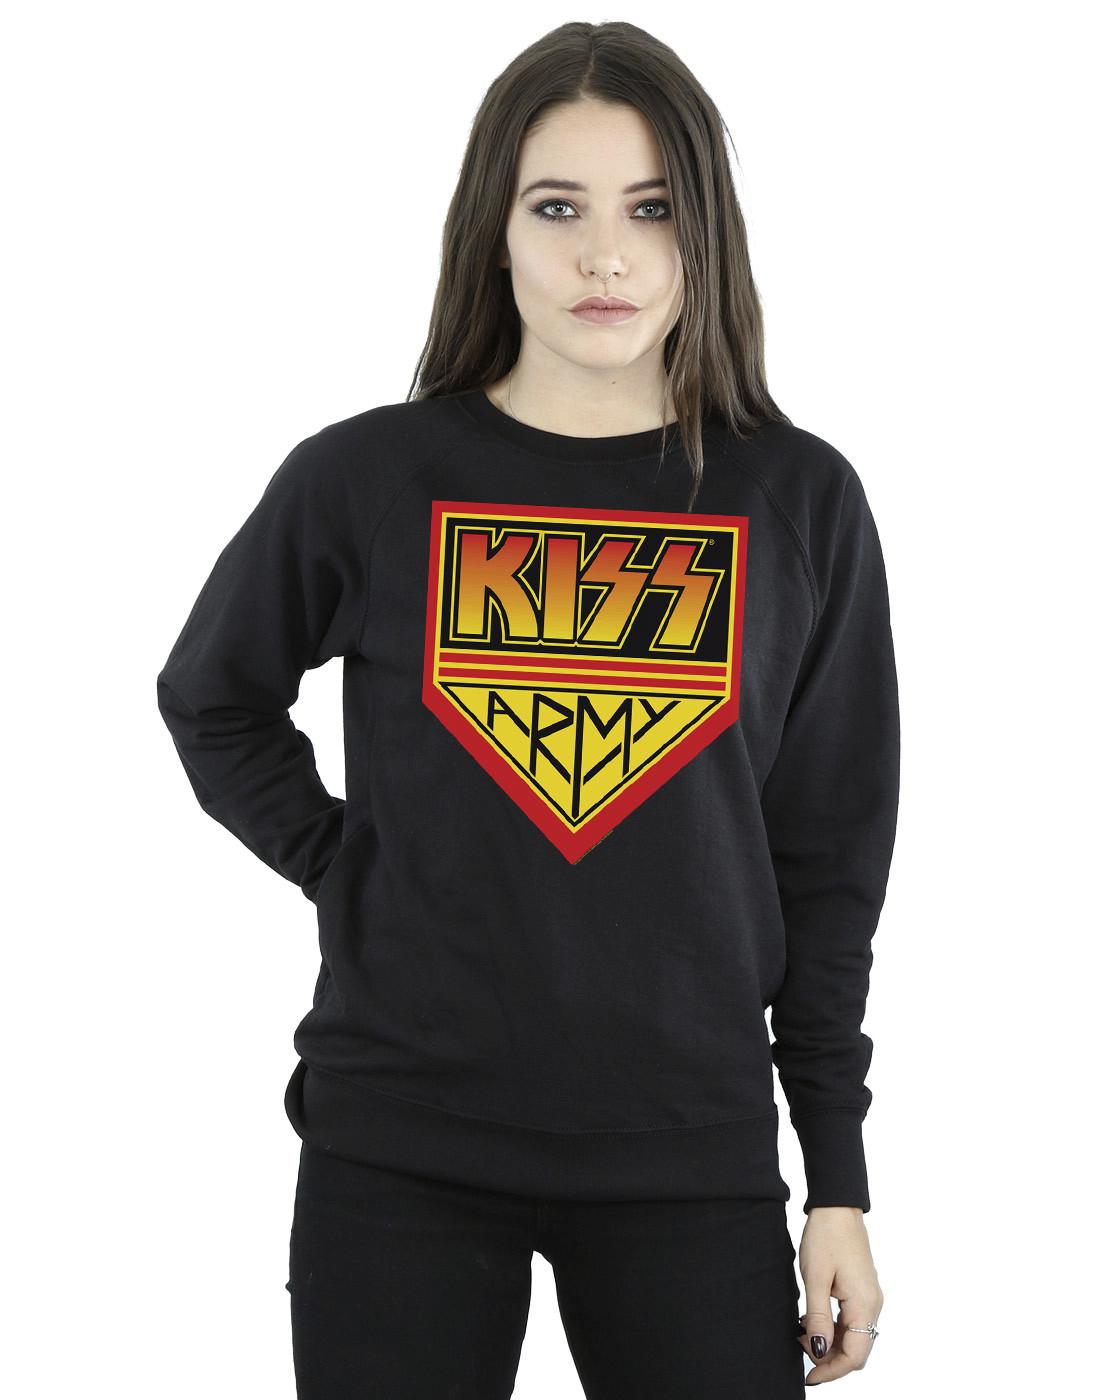 KISS Women's Army Sweatshirt